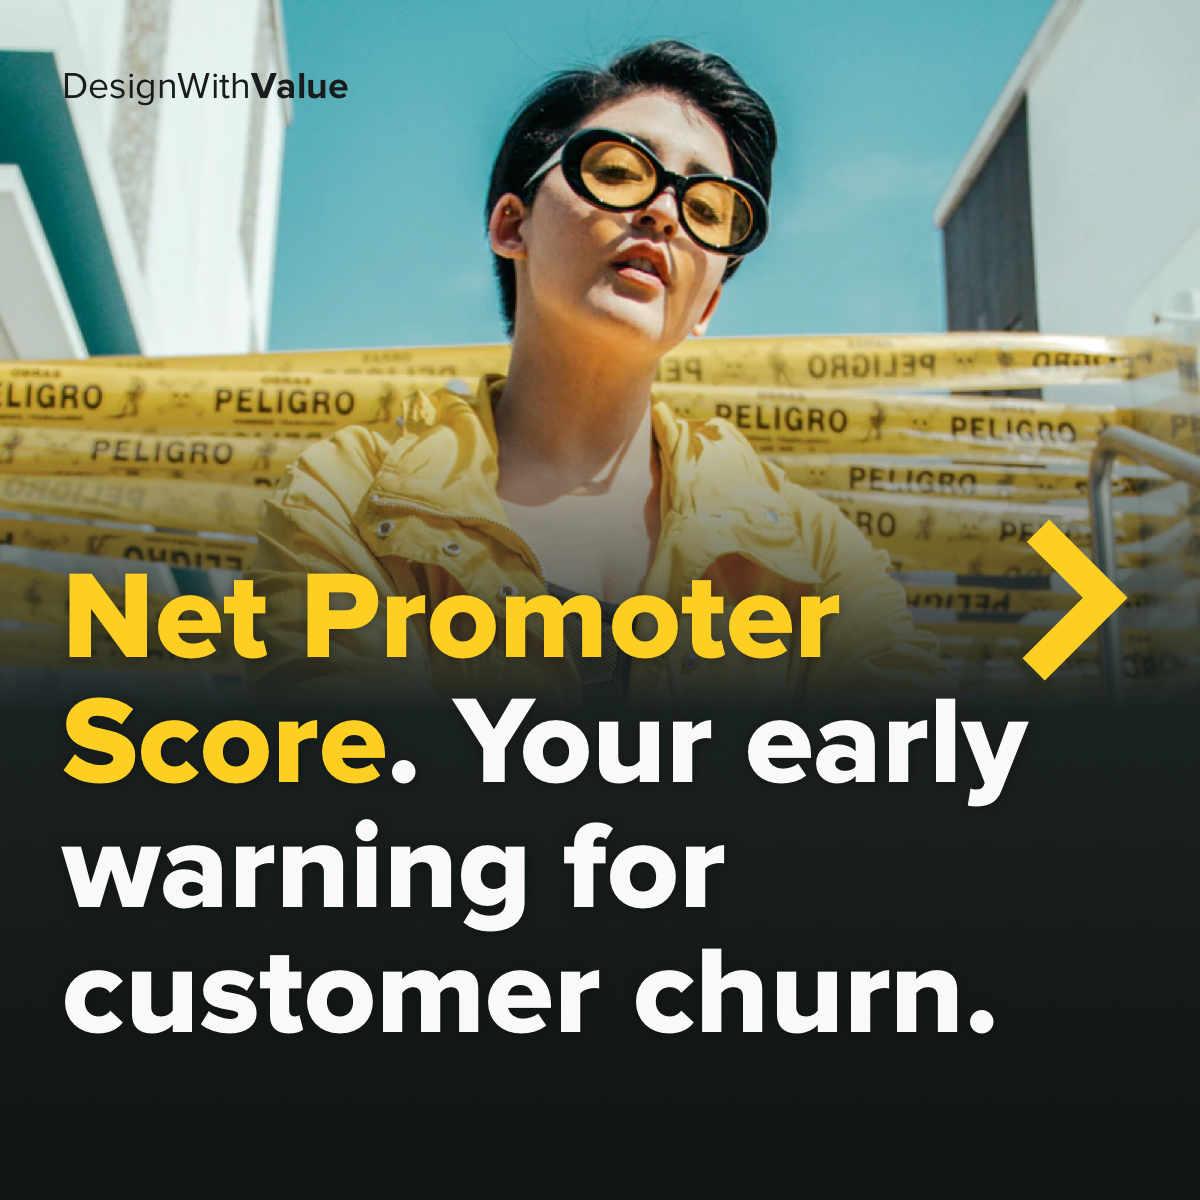 Net promoter score. Your early warning for customer churn.